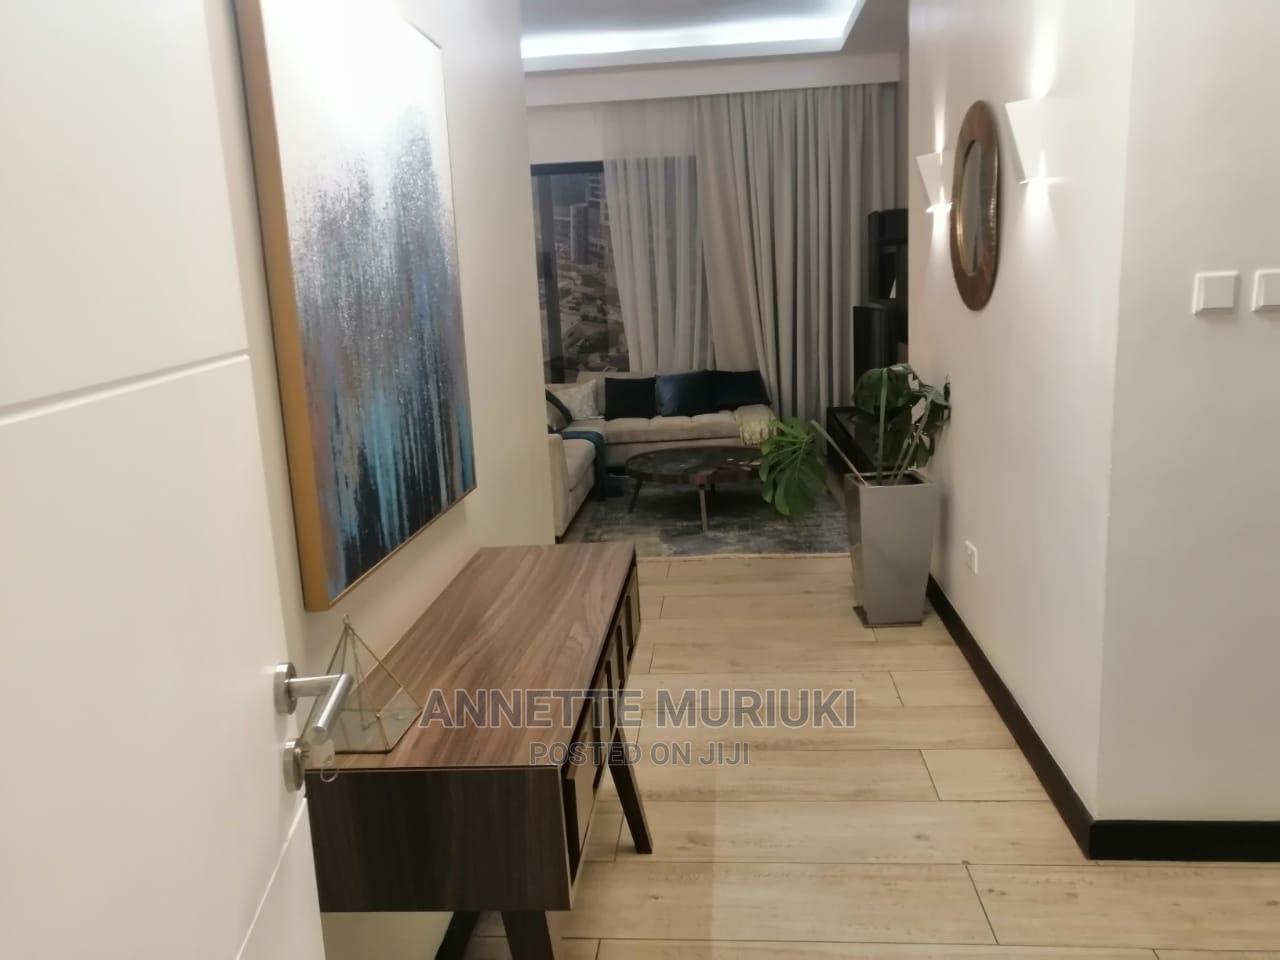 3bdrm Apartment in Ruaka for Sale